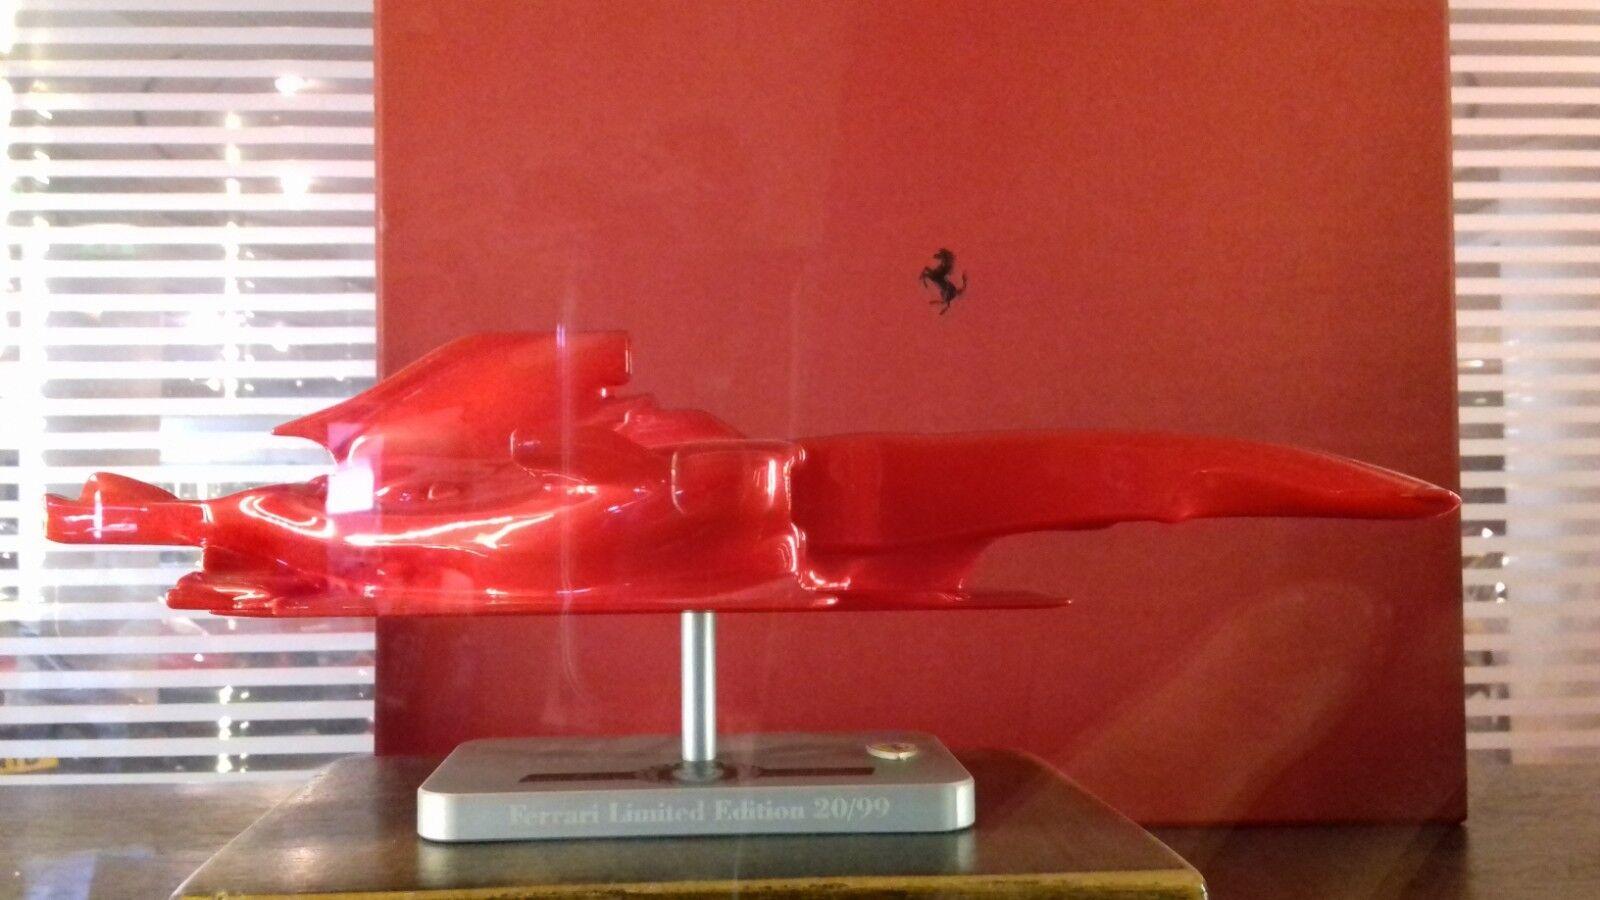 OFFICIAL FERRARI F1 F1 F1 2008 1 12 SILHOUETTE ART PIECE LIMITED EDITION 100pcs F2008 5ebe46